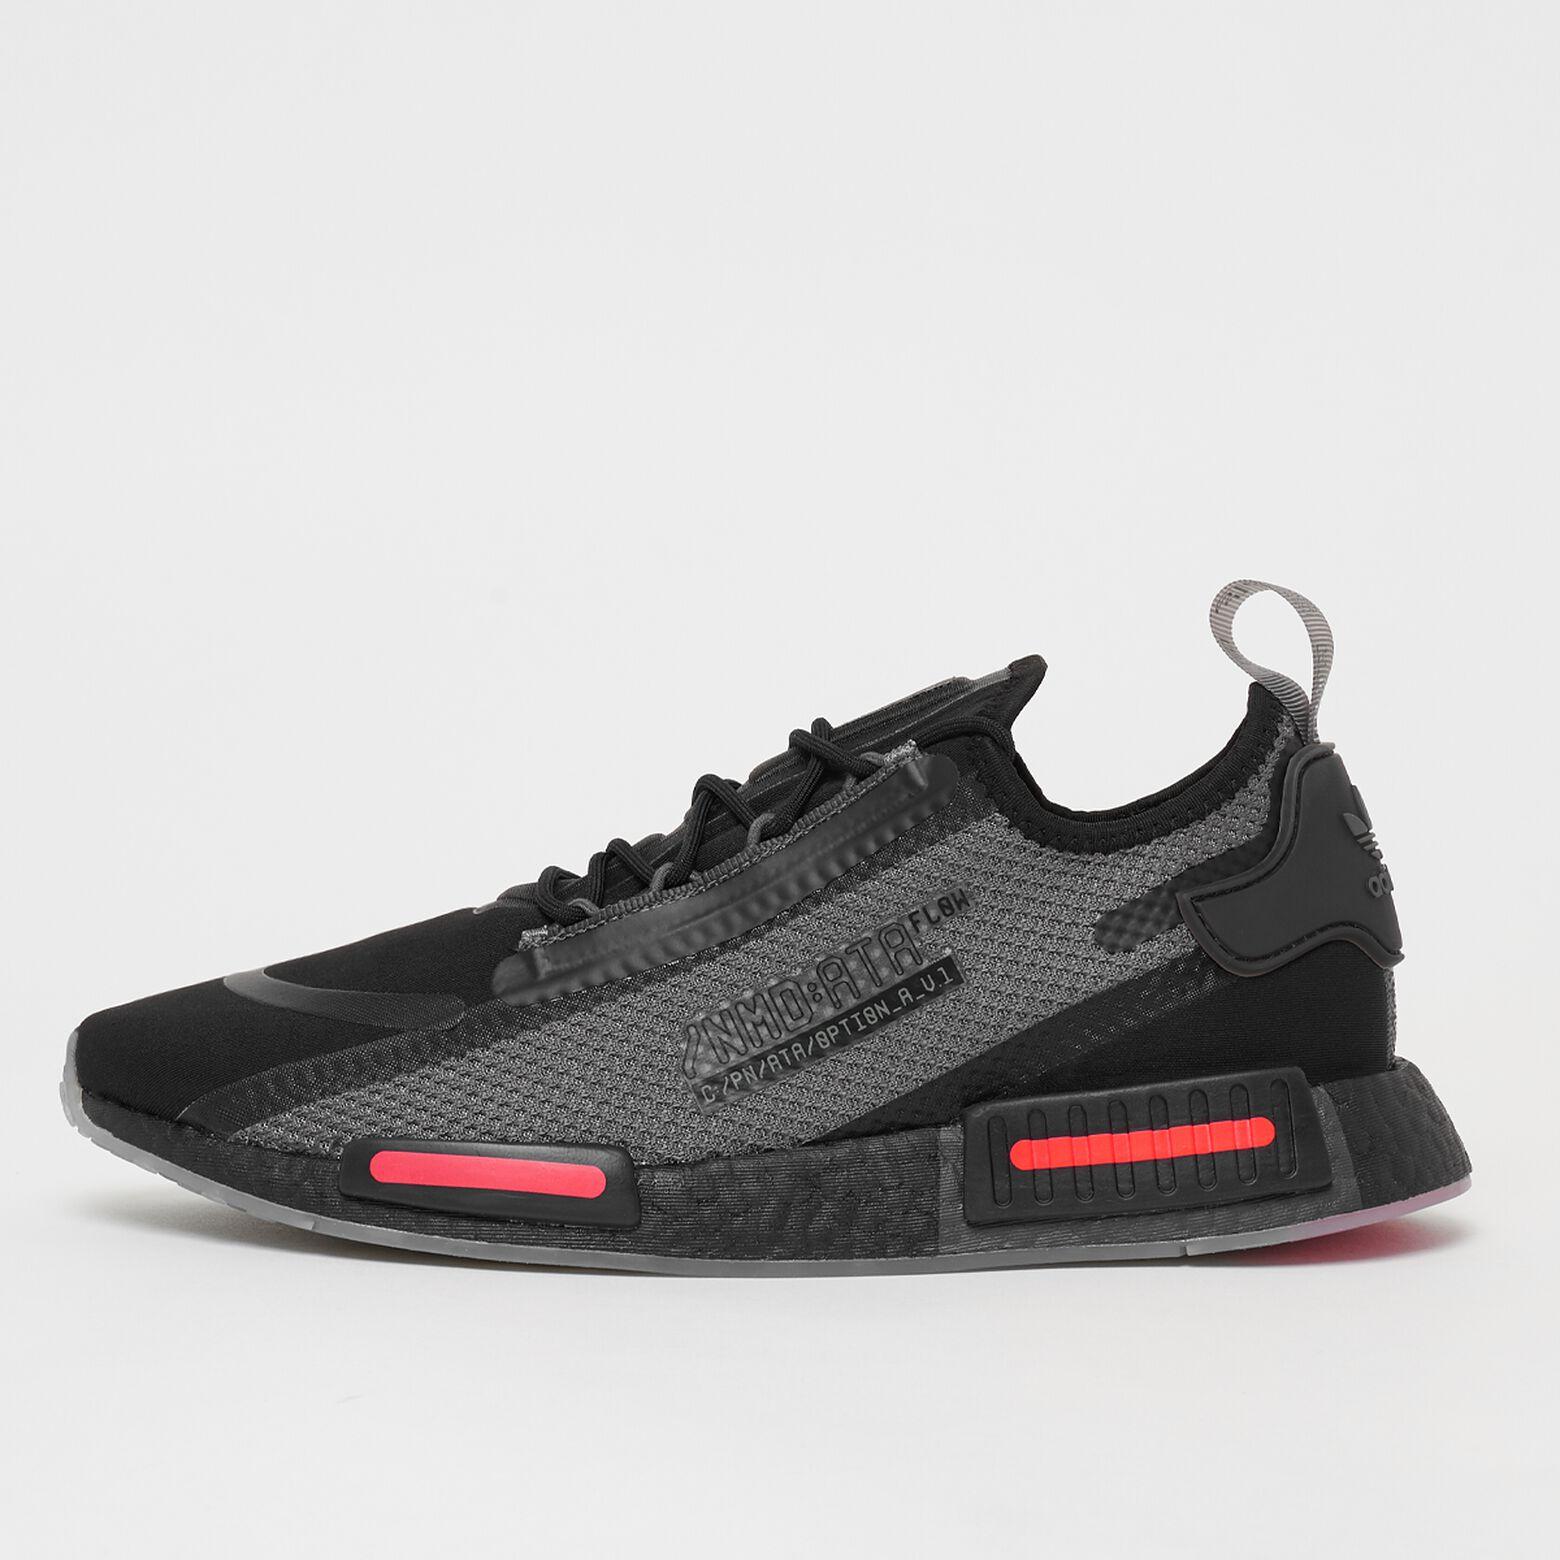 ADIDAS ORIGINALS NMD_R1 SPECTOO Sneaker (Gr. 40 - 42)